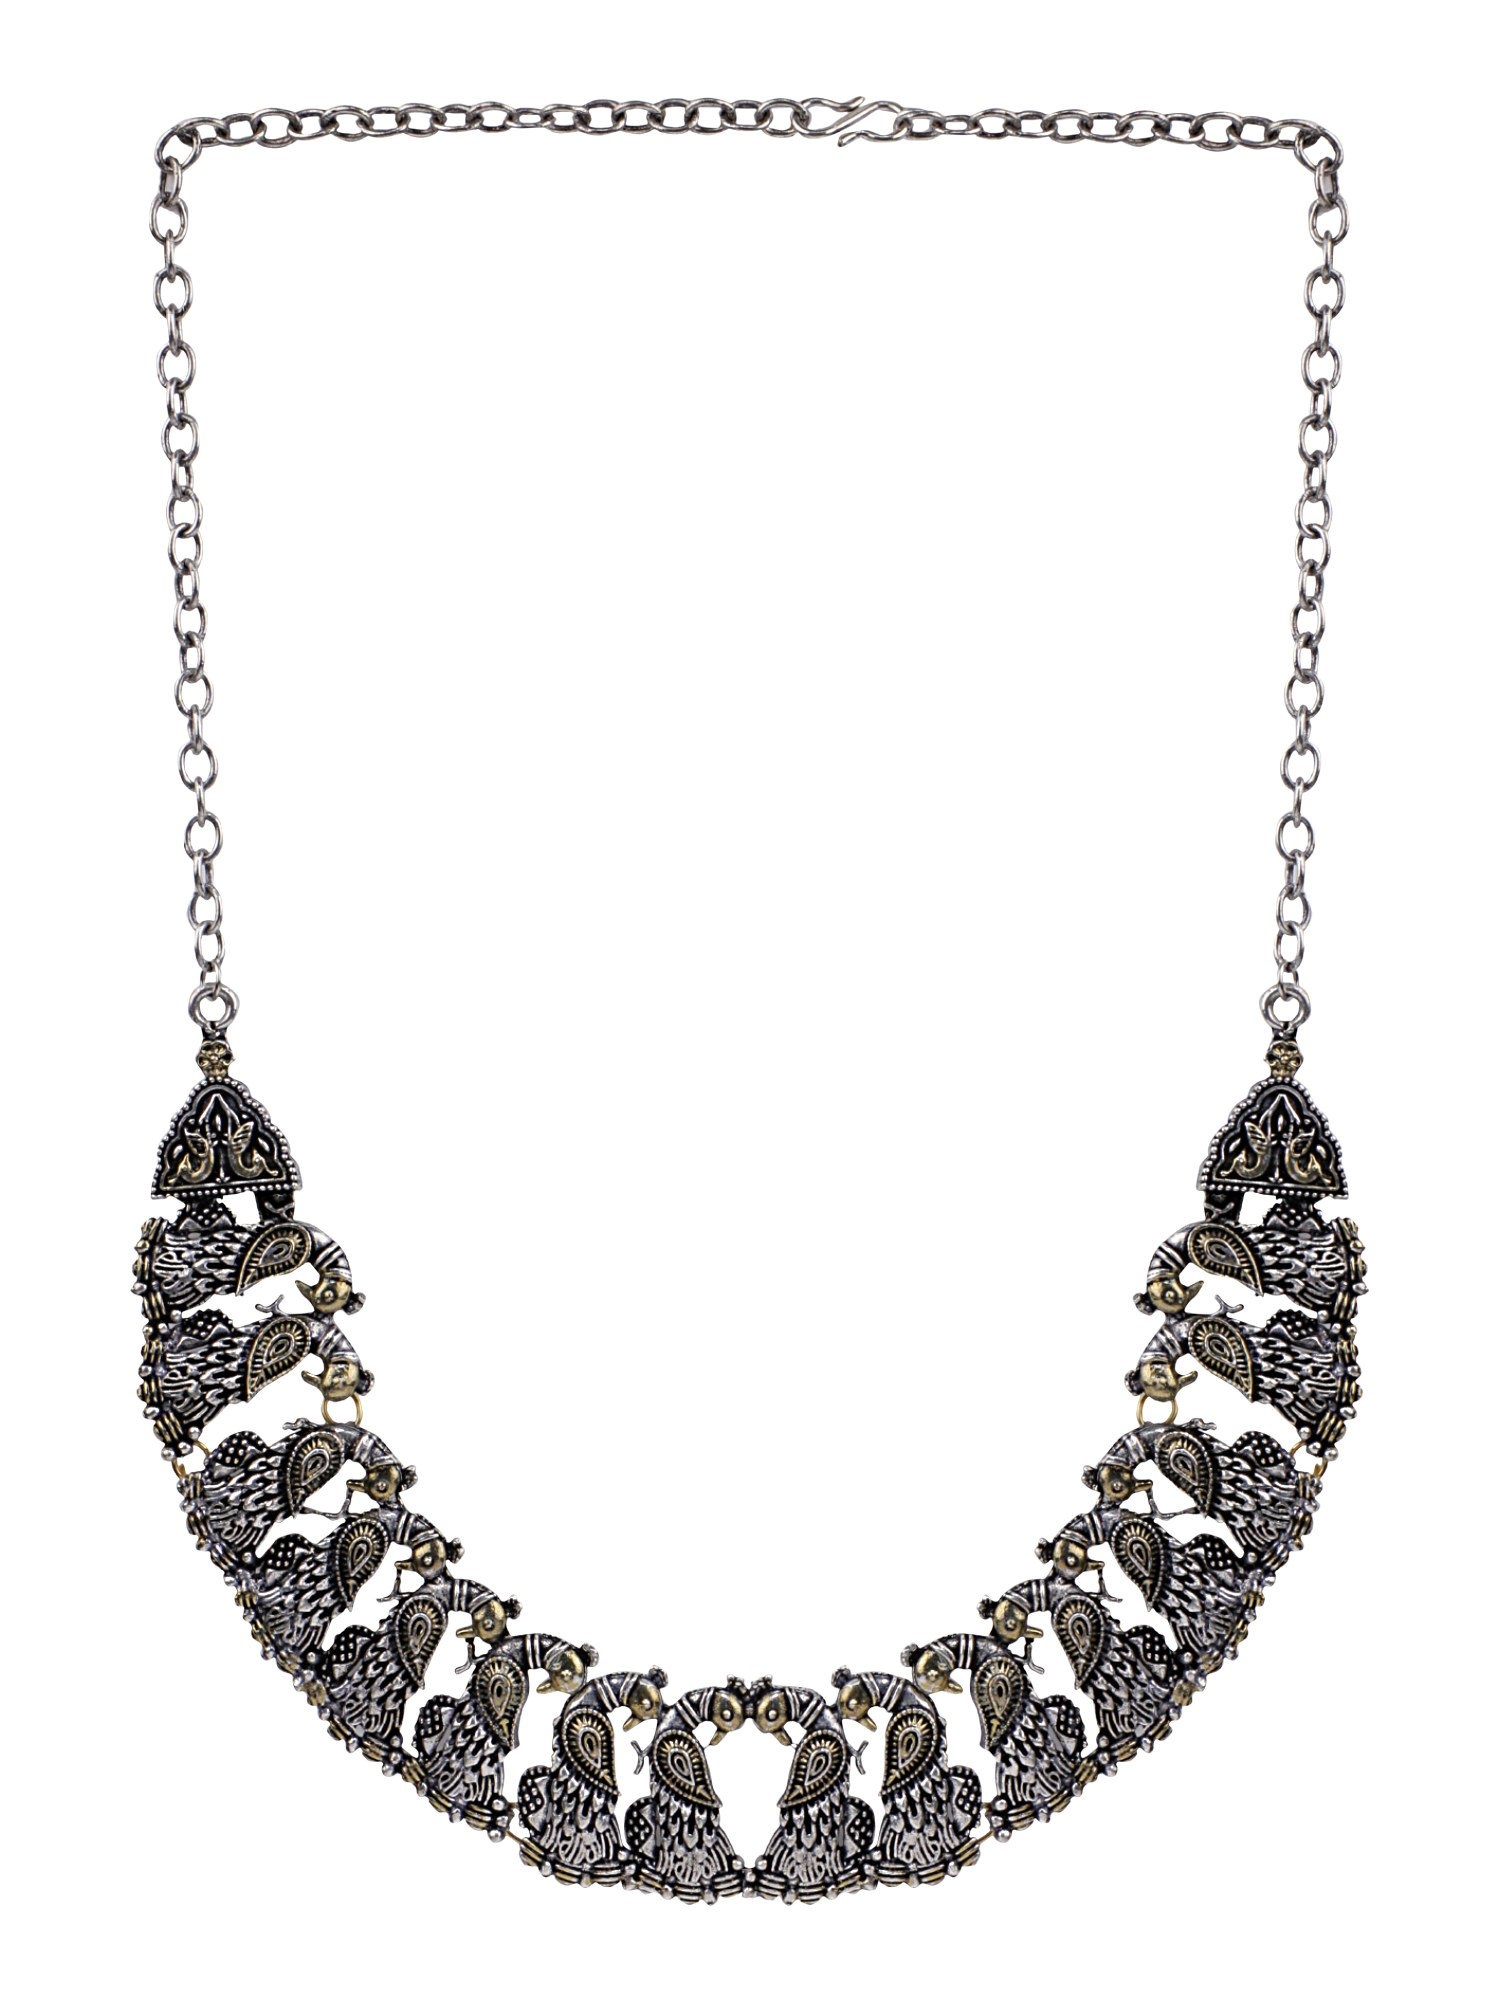 Efulgenz Boho Vintage Antique Ethnic Gypsy Tribal Indian Oxidized Silver Beaded Statement Necklace Jewelry